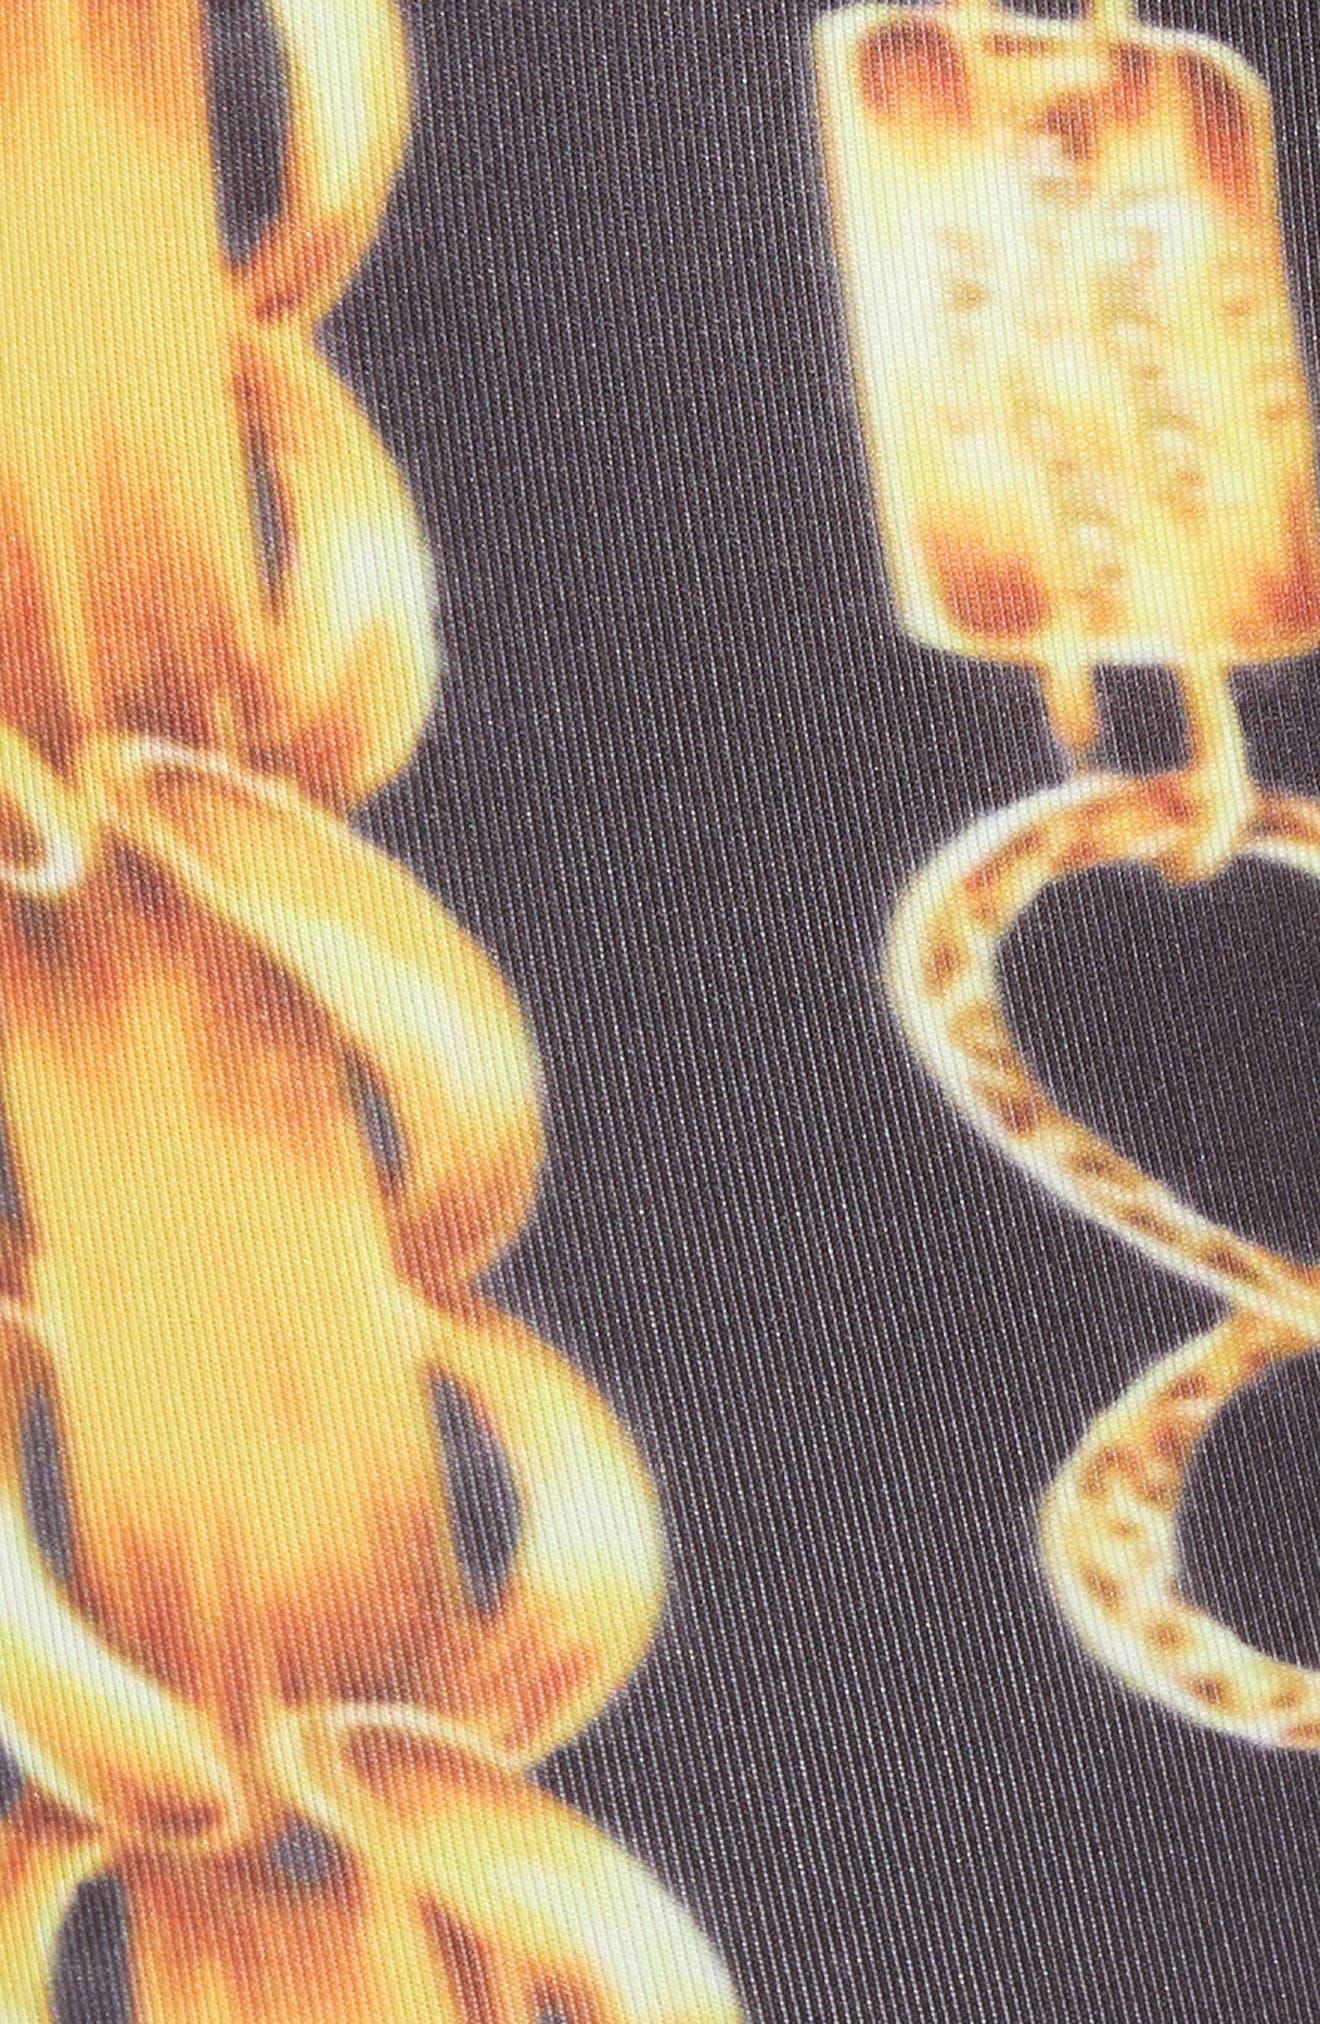 Gold Chain Sace Boxer Briefs,                             Alternate thumbnail 5, color,                             WHITE/ GOLD/ BLACK